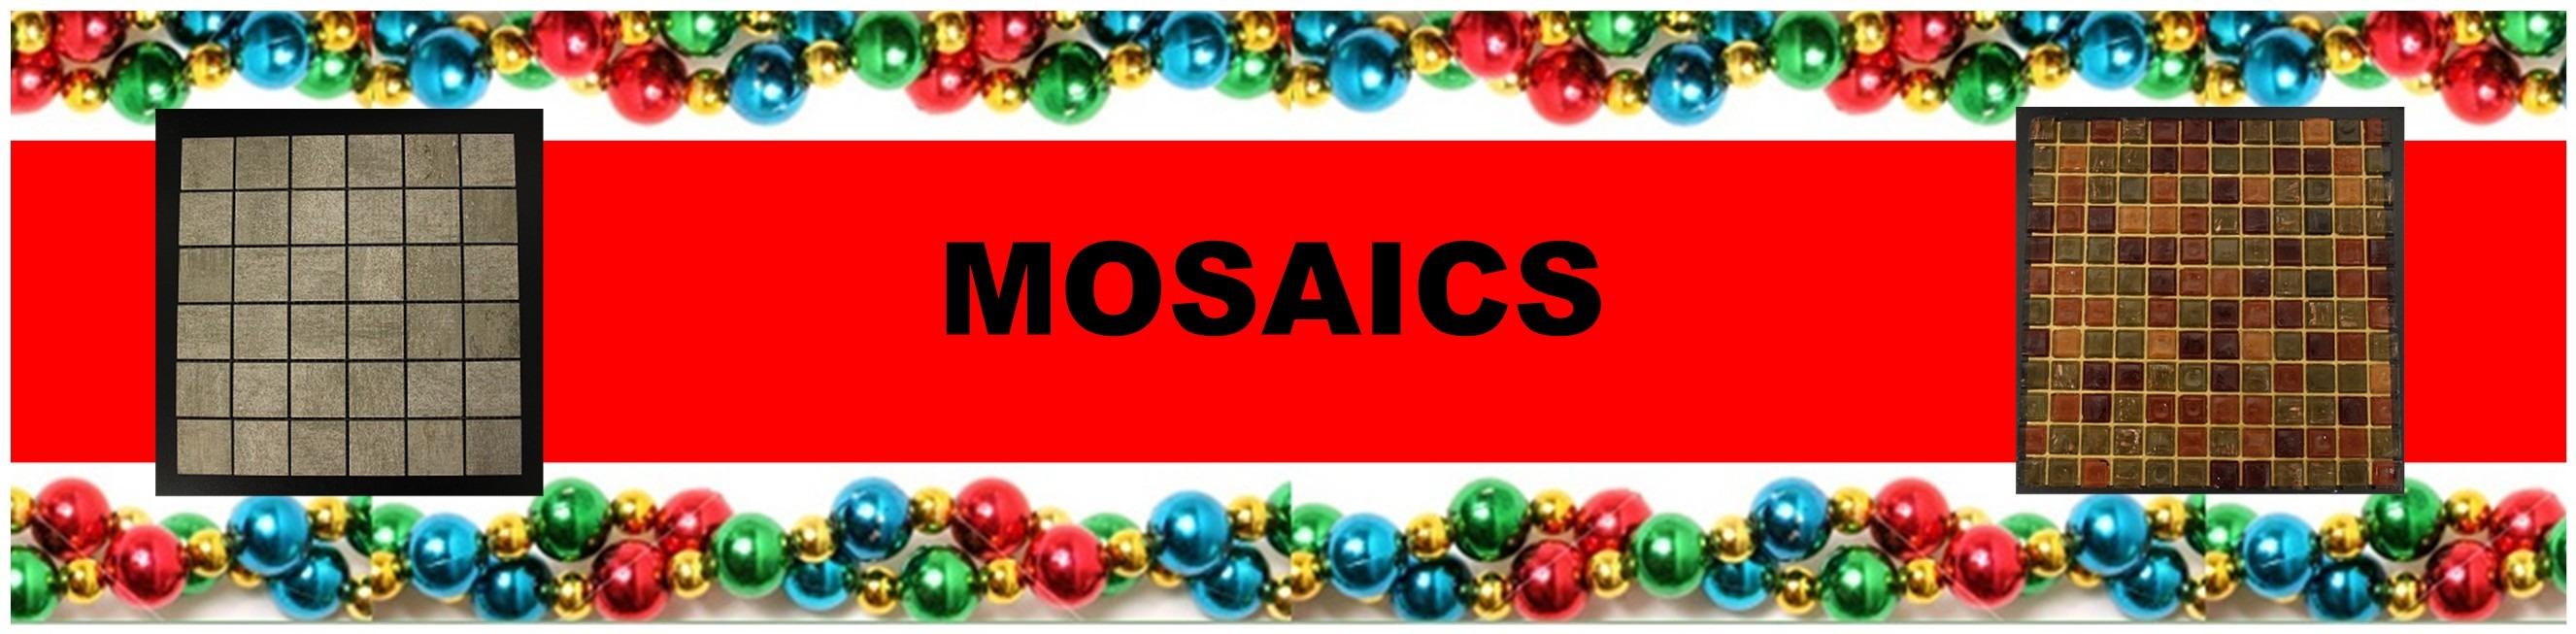 CHRISTMAS MOSAICS HEADER